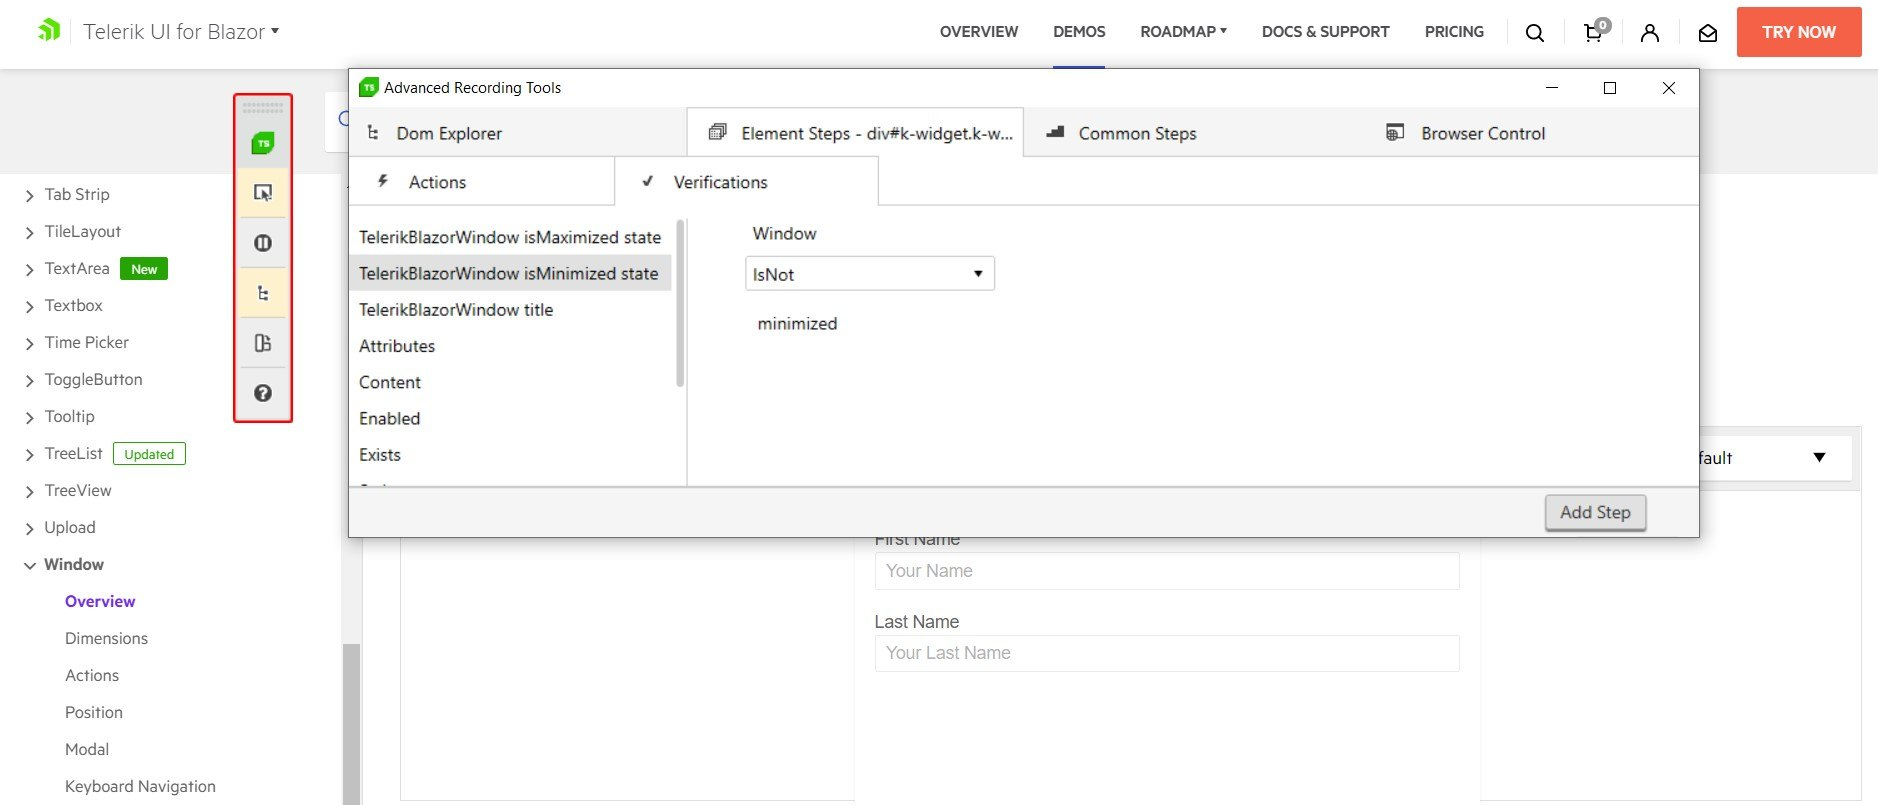 Translator for Telerik UI for Blazor Window - Verify if Minimized